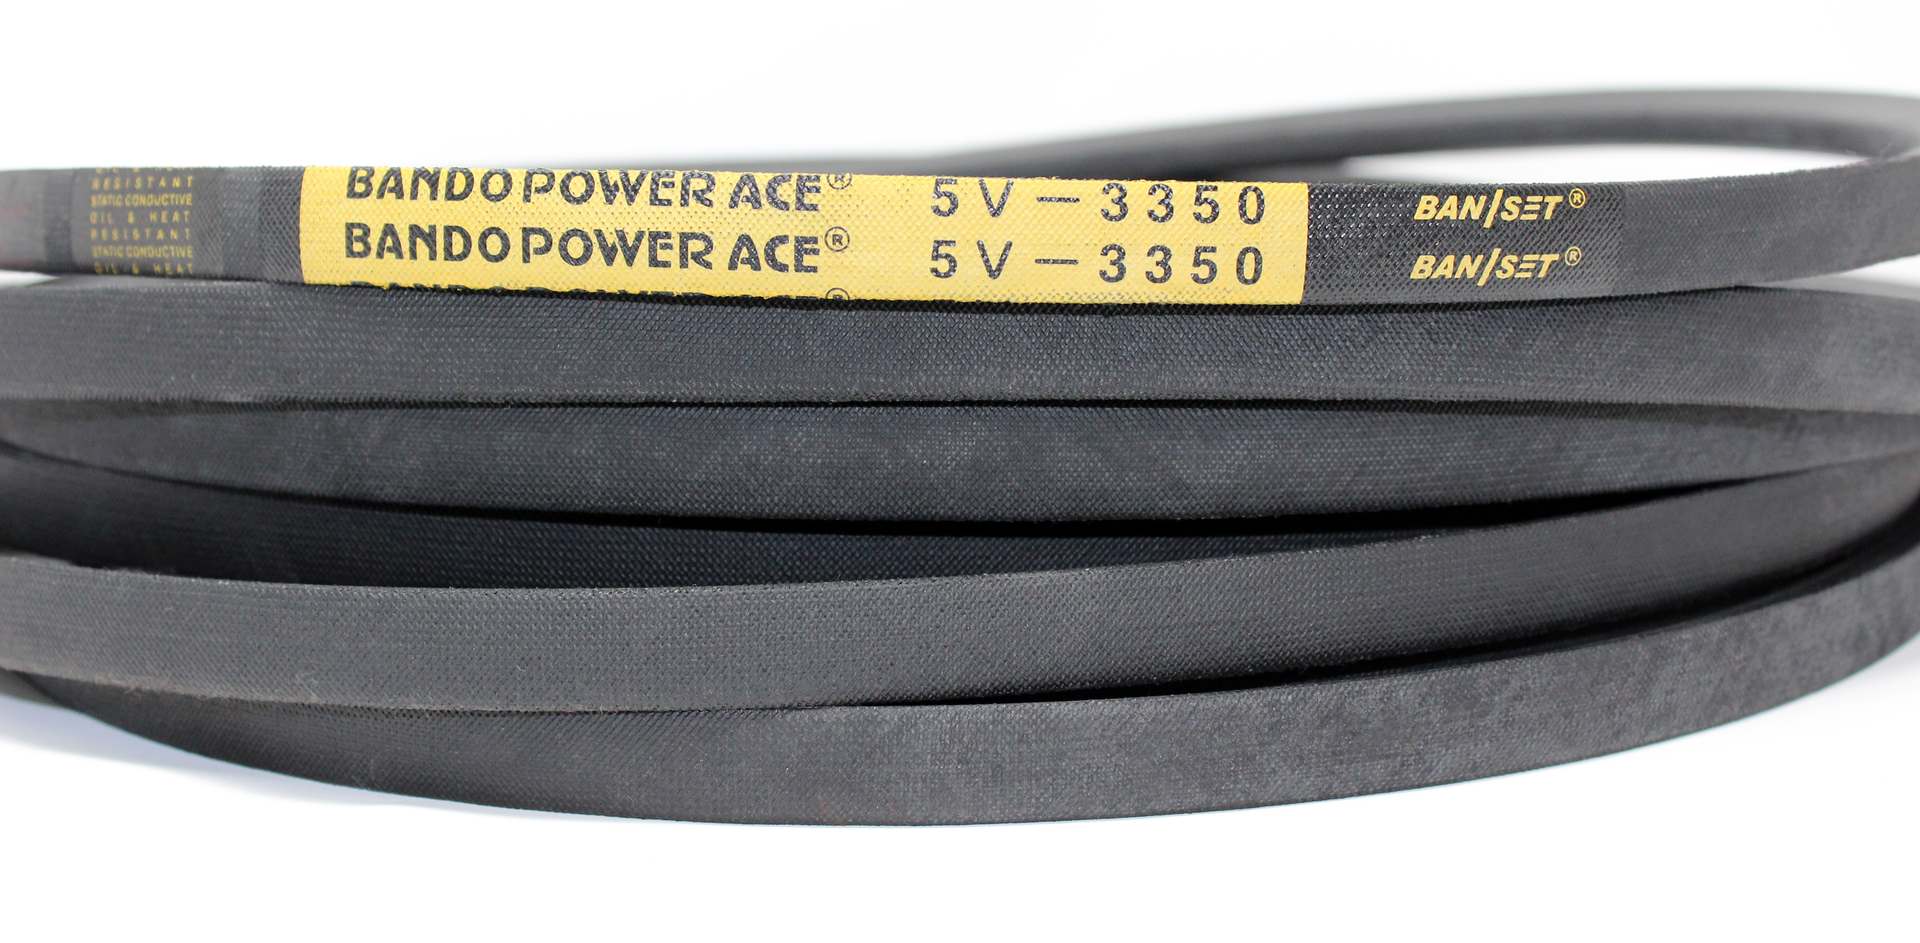 Power Ace® (3V, 5V, 8V)